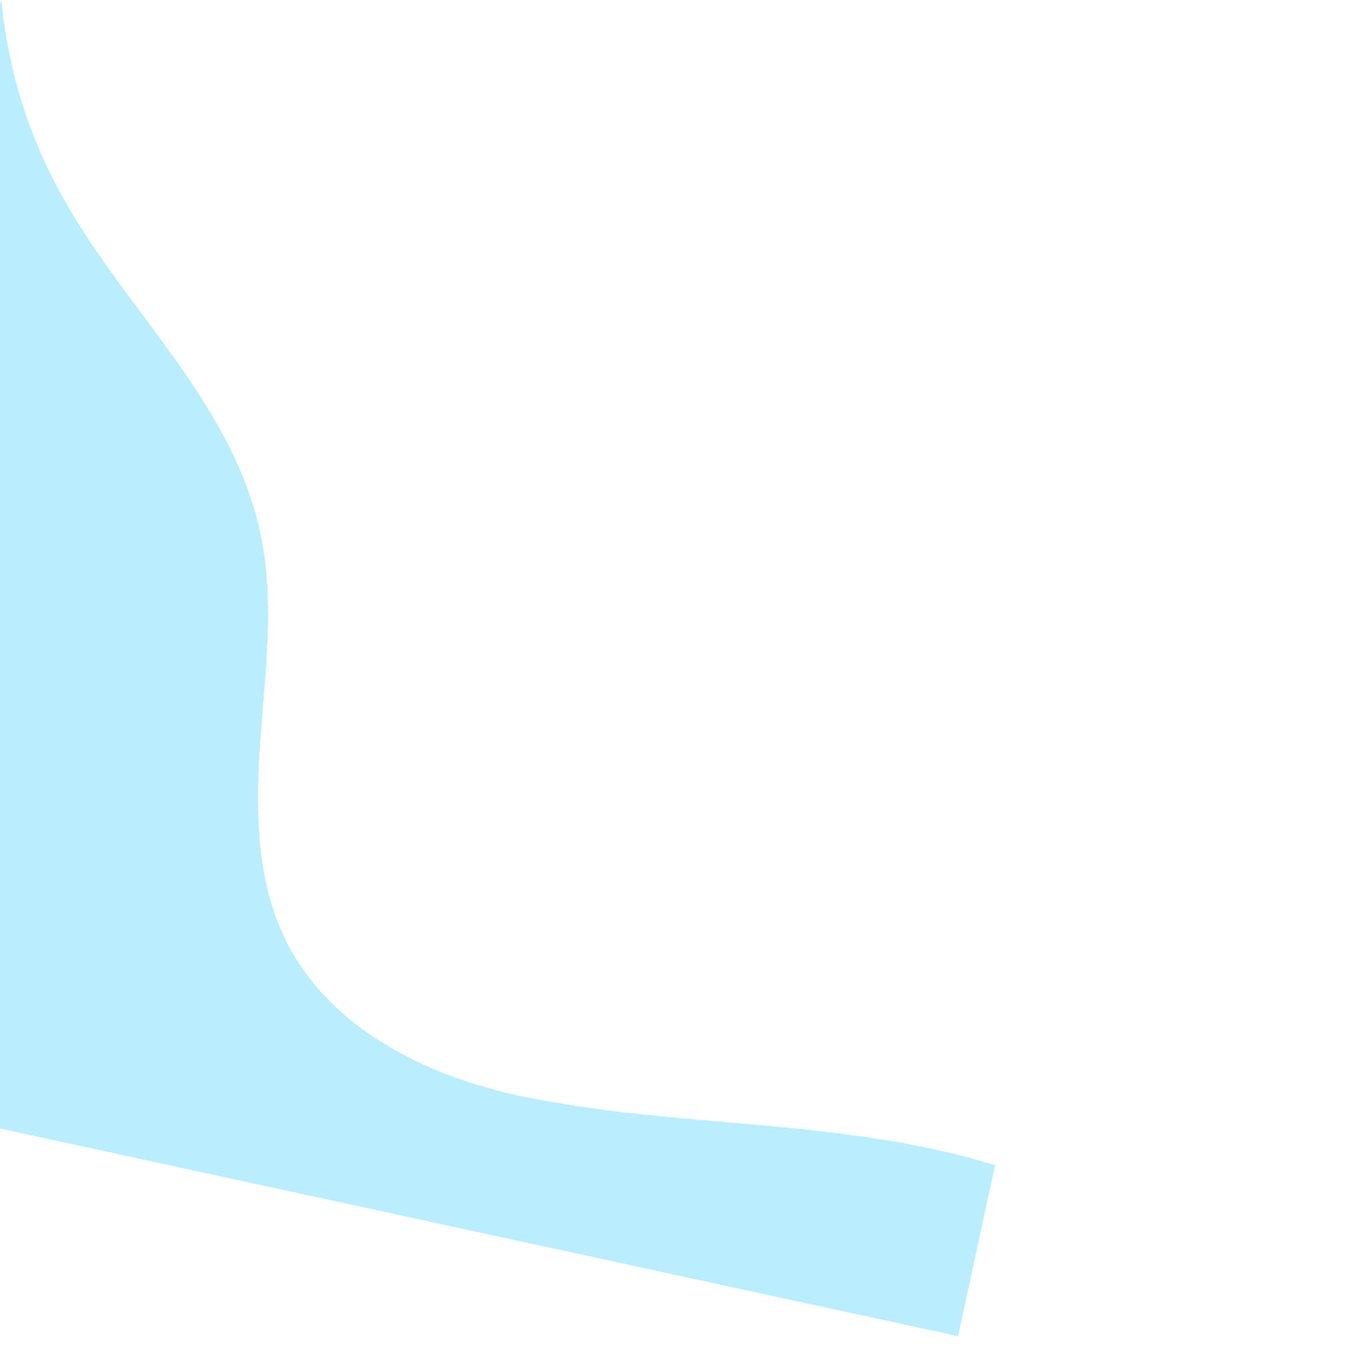 BlueBackgroundPiece1.jpg